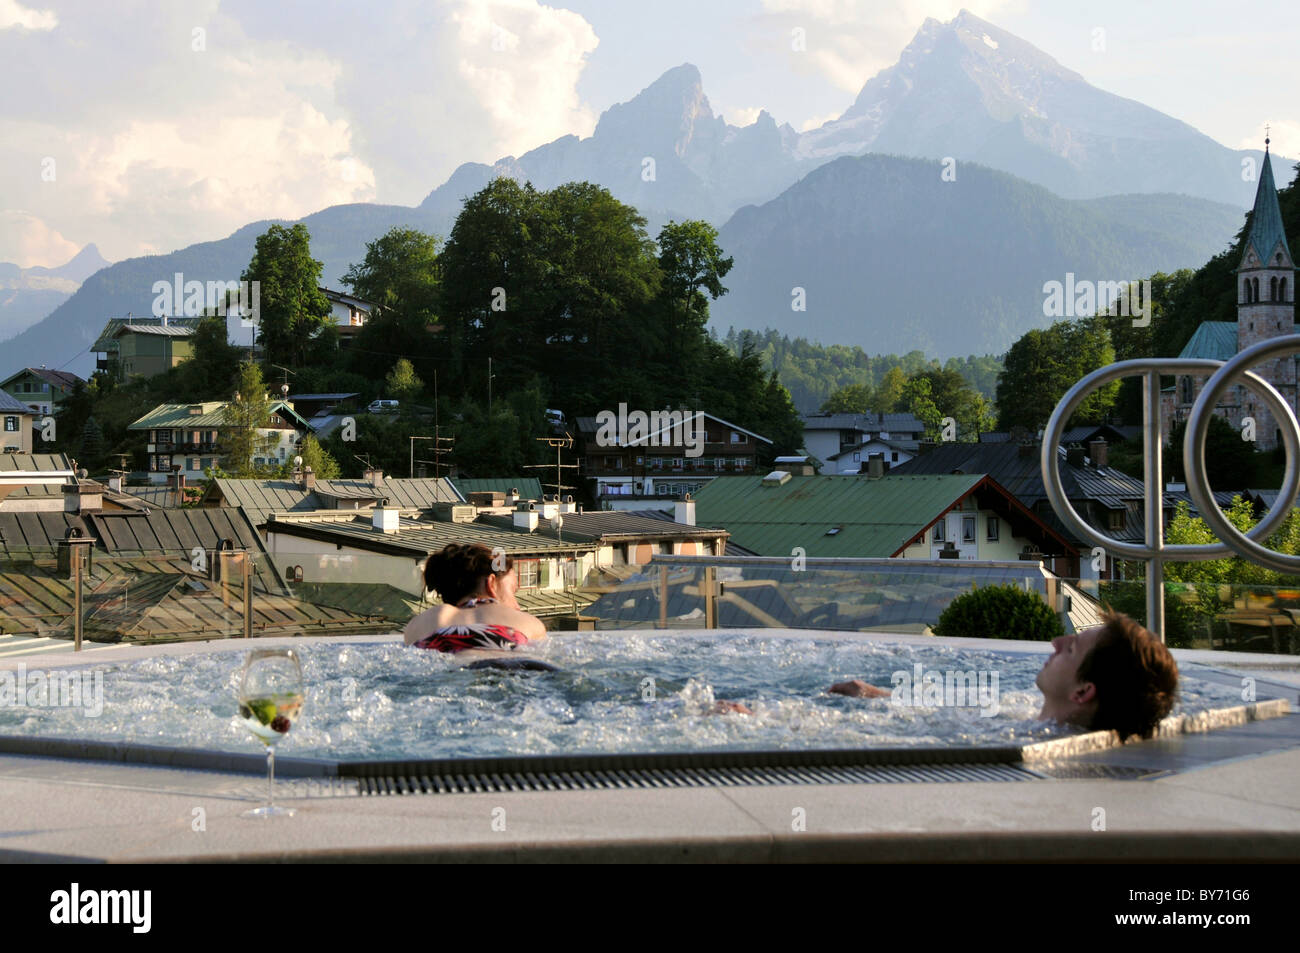 Whirlpool Mit Watzmann Hotel Edelweiss Berchtesgaden